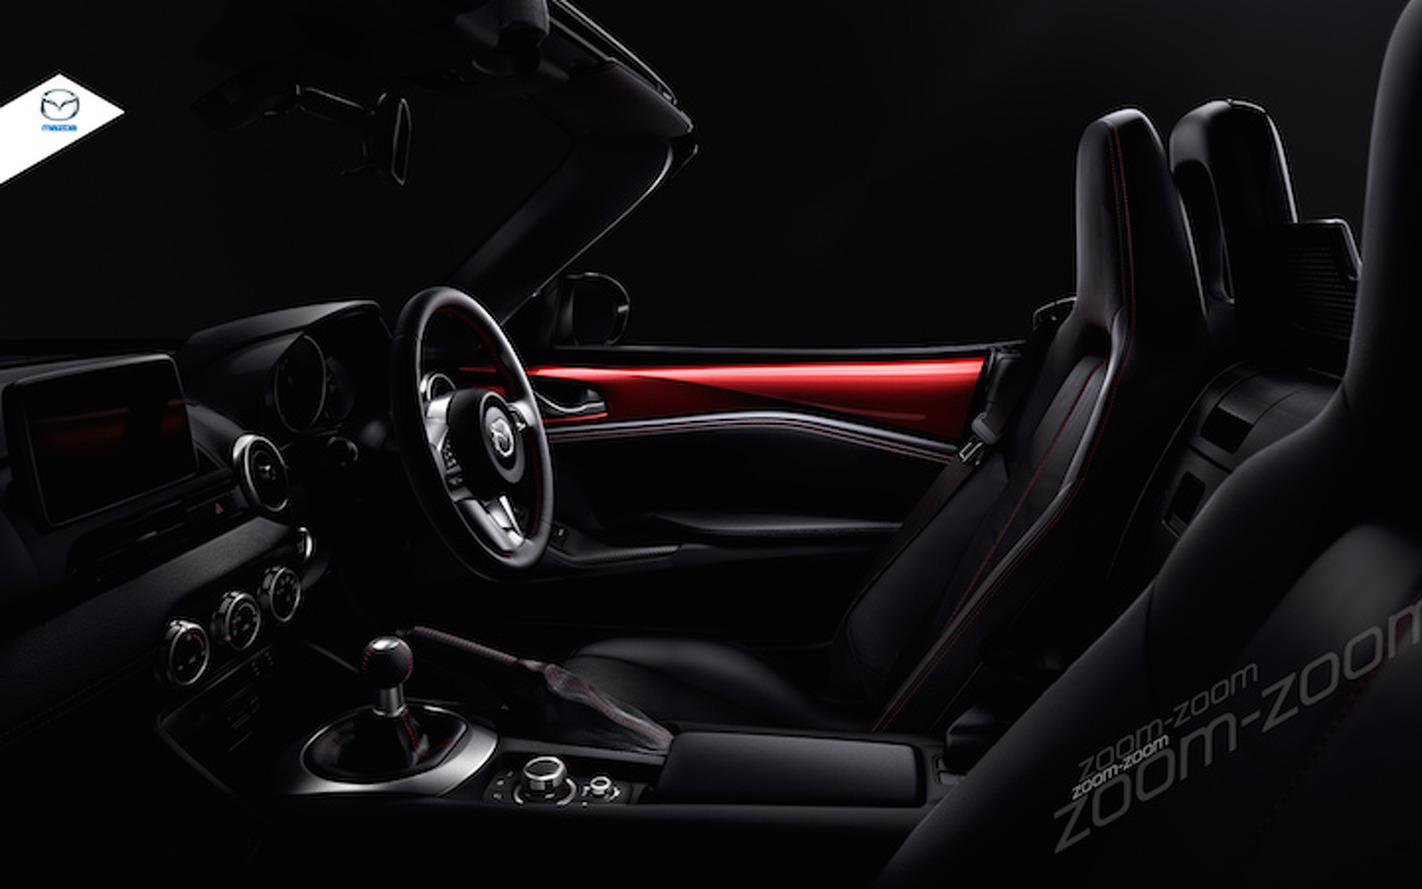 2016 Mazda MX-5 Miata Revealed, Is Almost Perfect